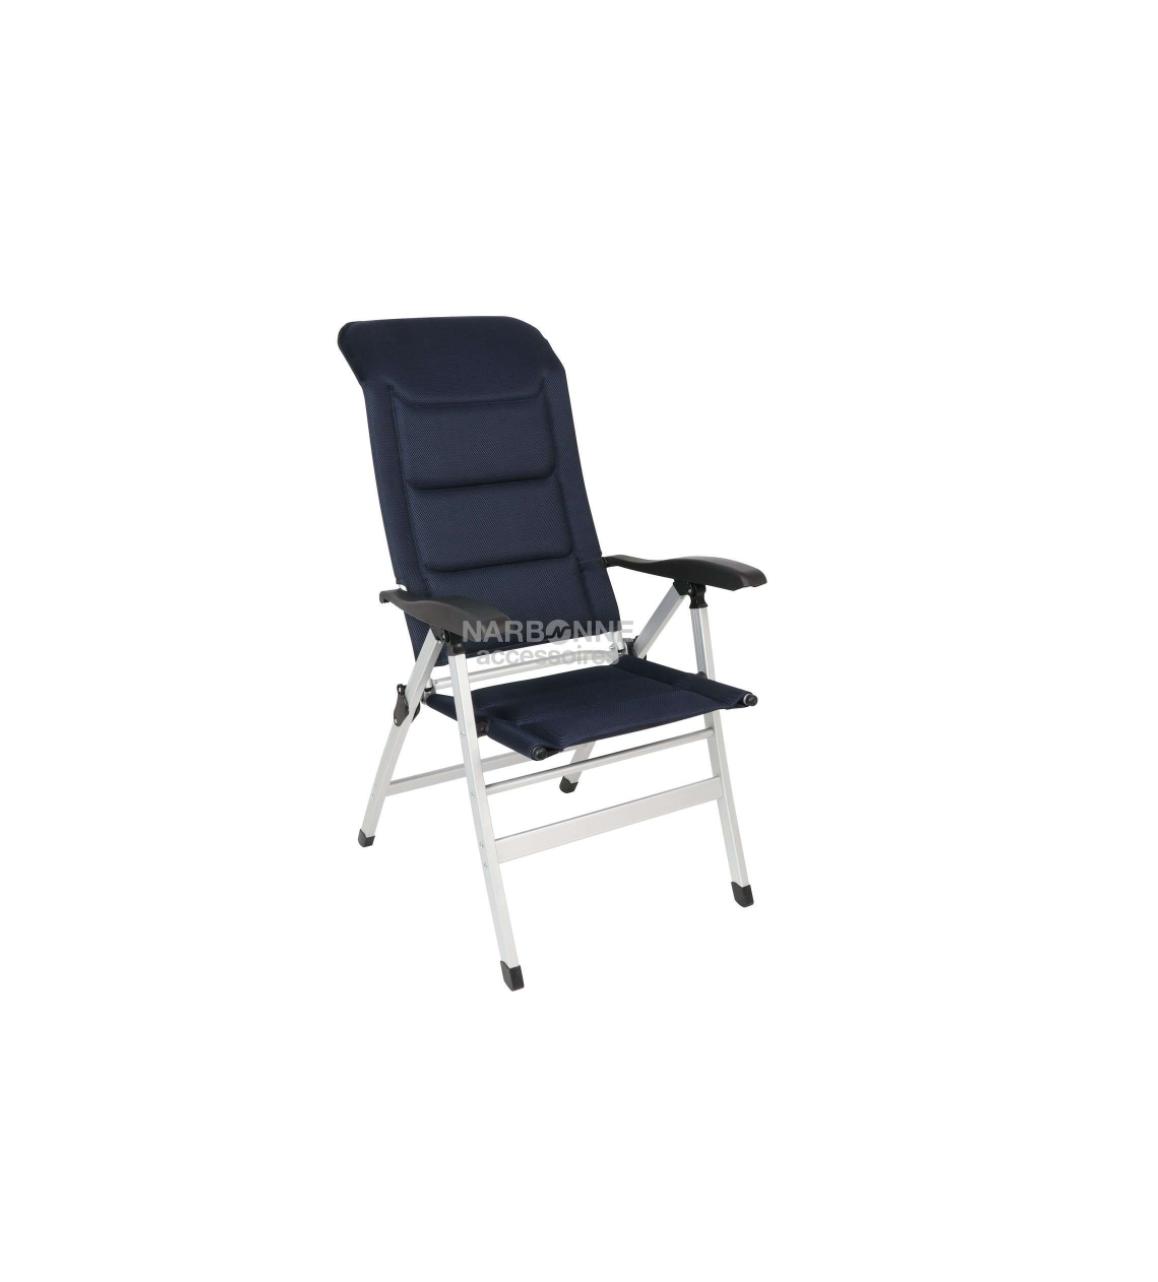 Midland Comfort Supreme Chair